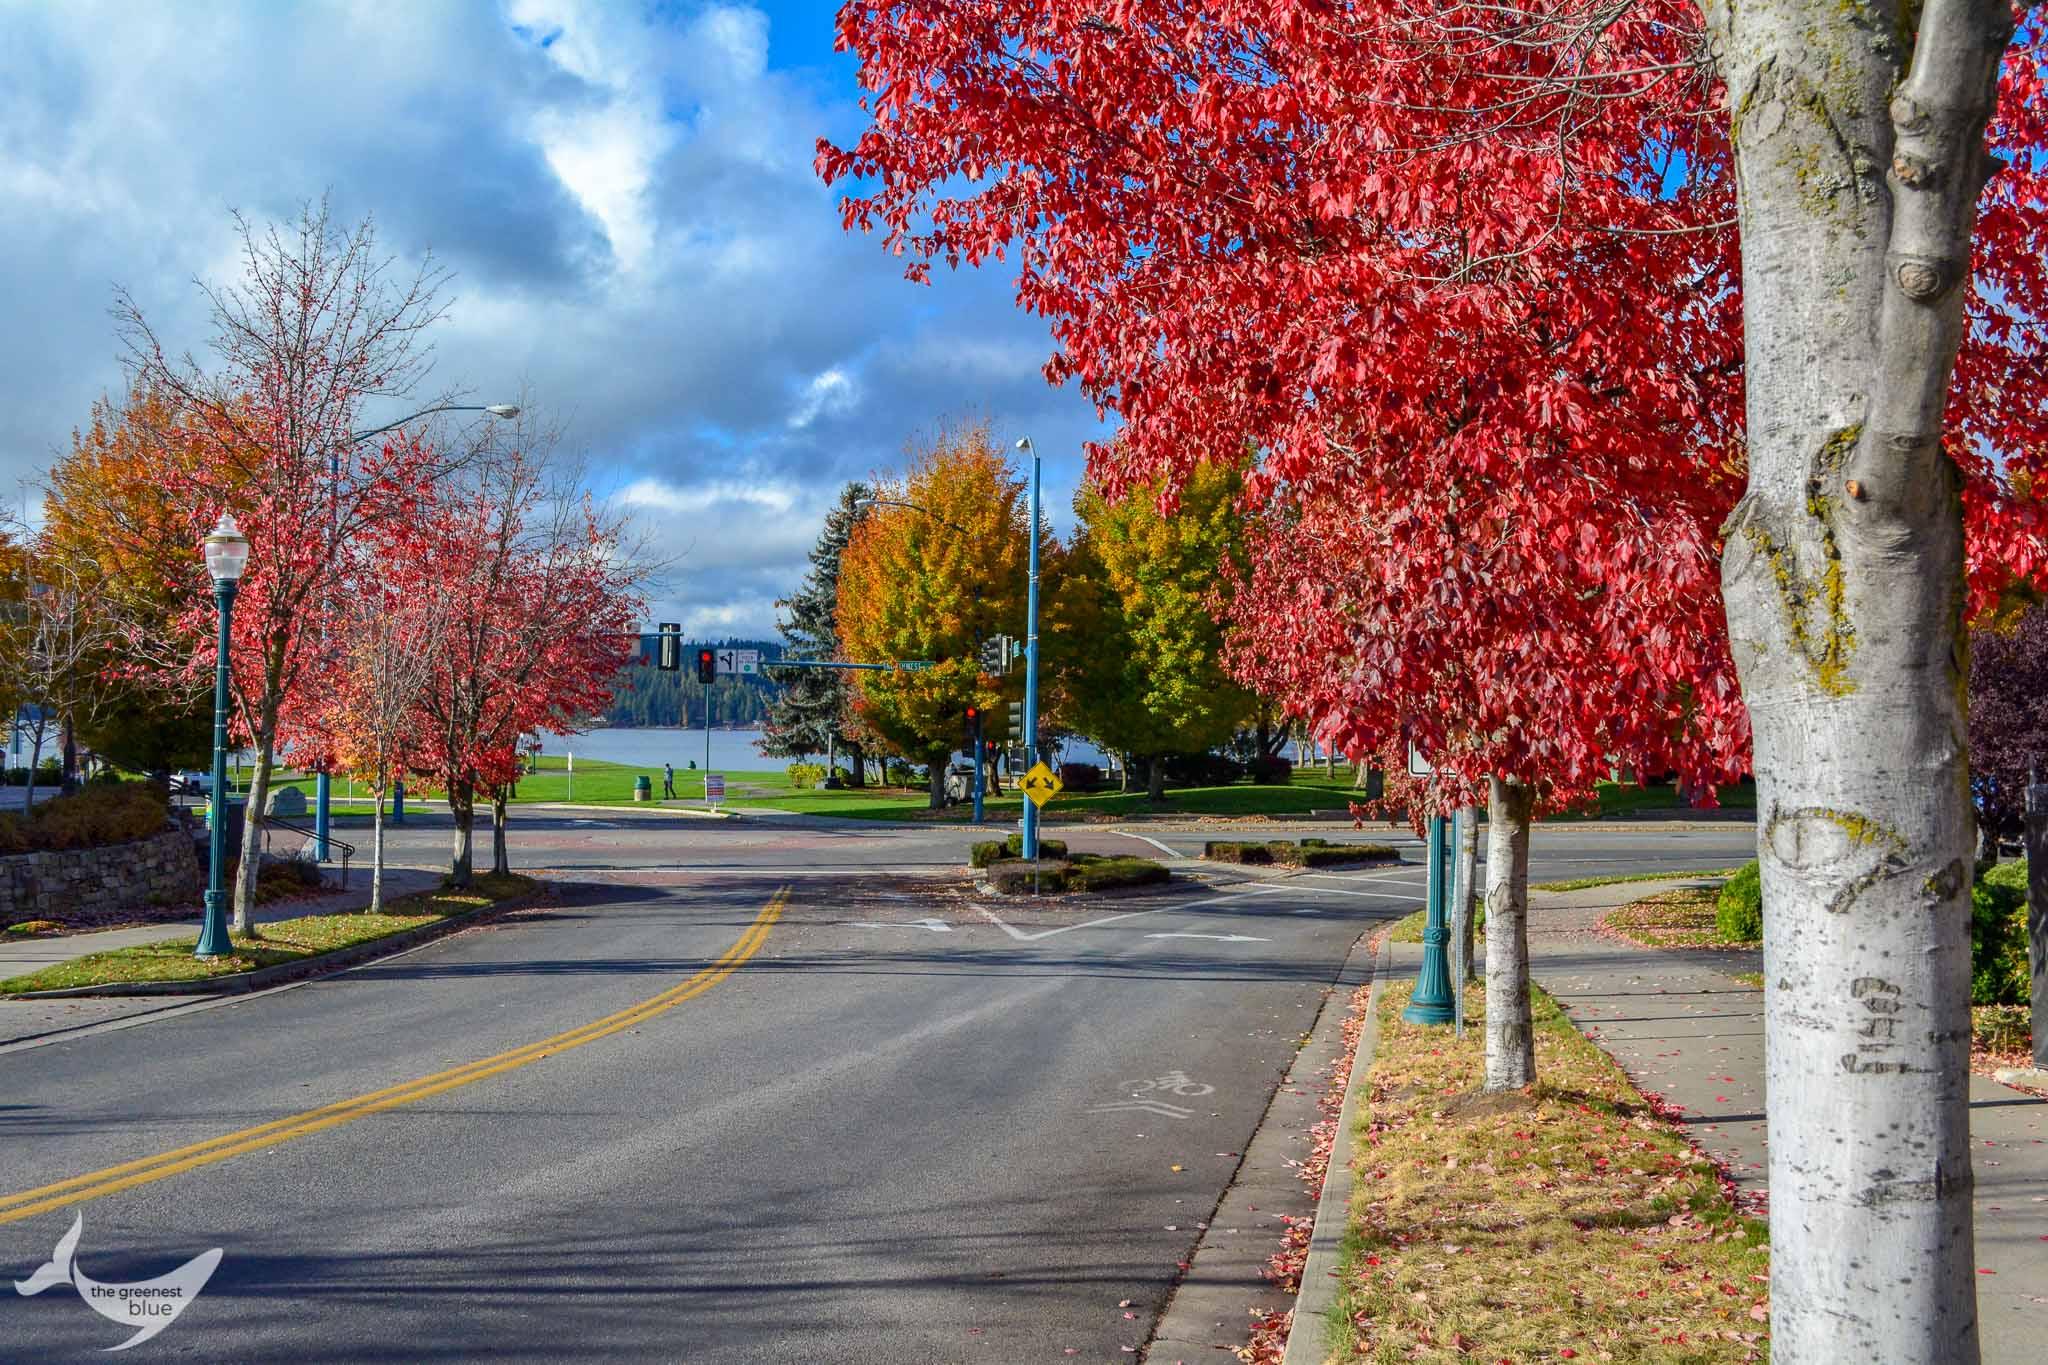 Fall in Coeur d'Alene, Idaho